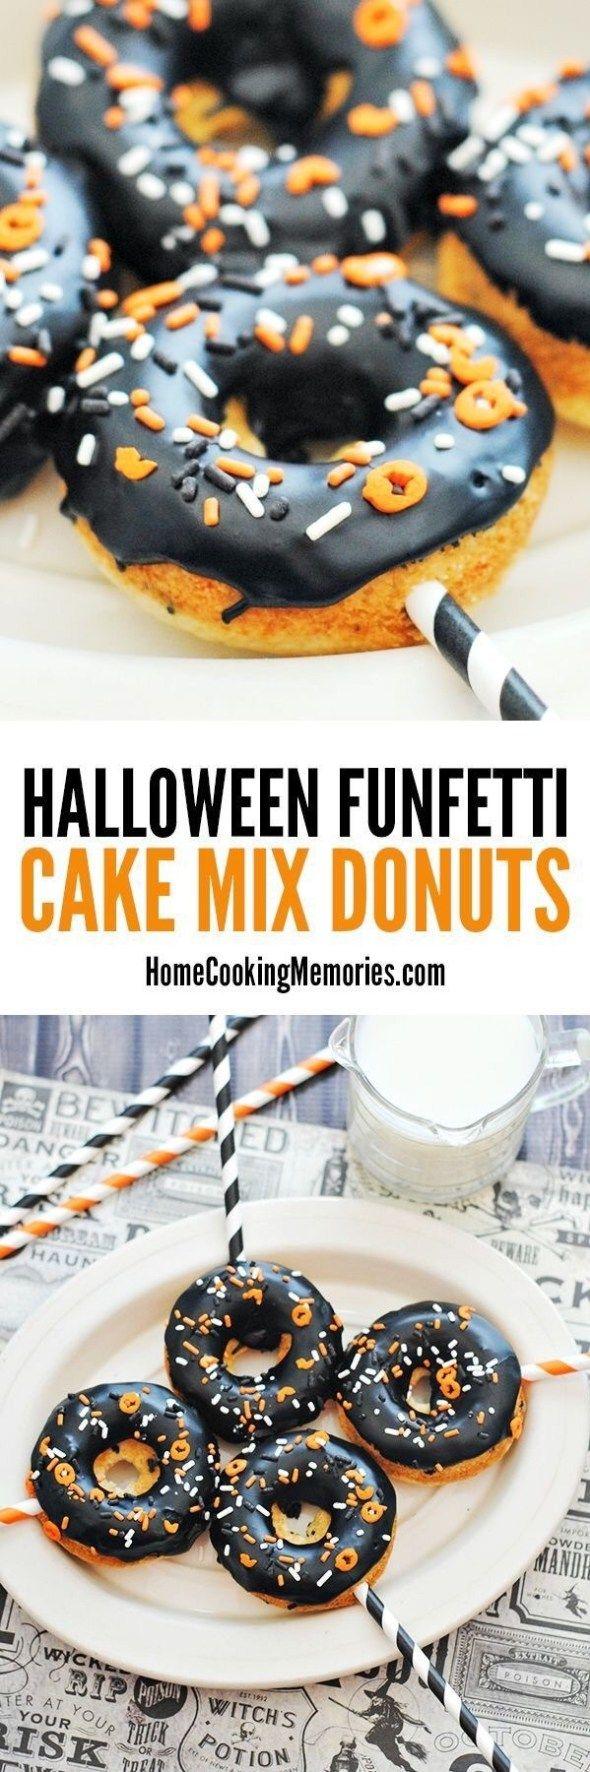 Halloween Funfetti Kuchen Mix Donuts